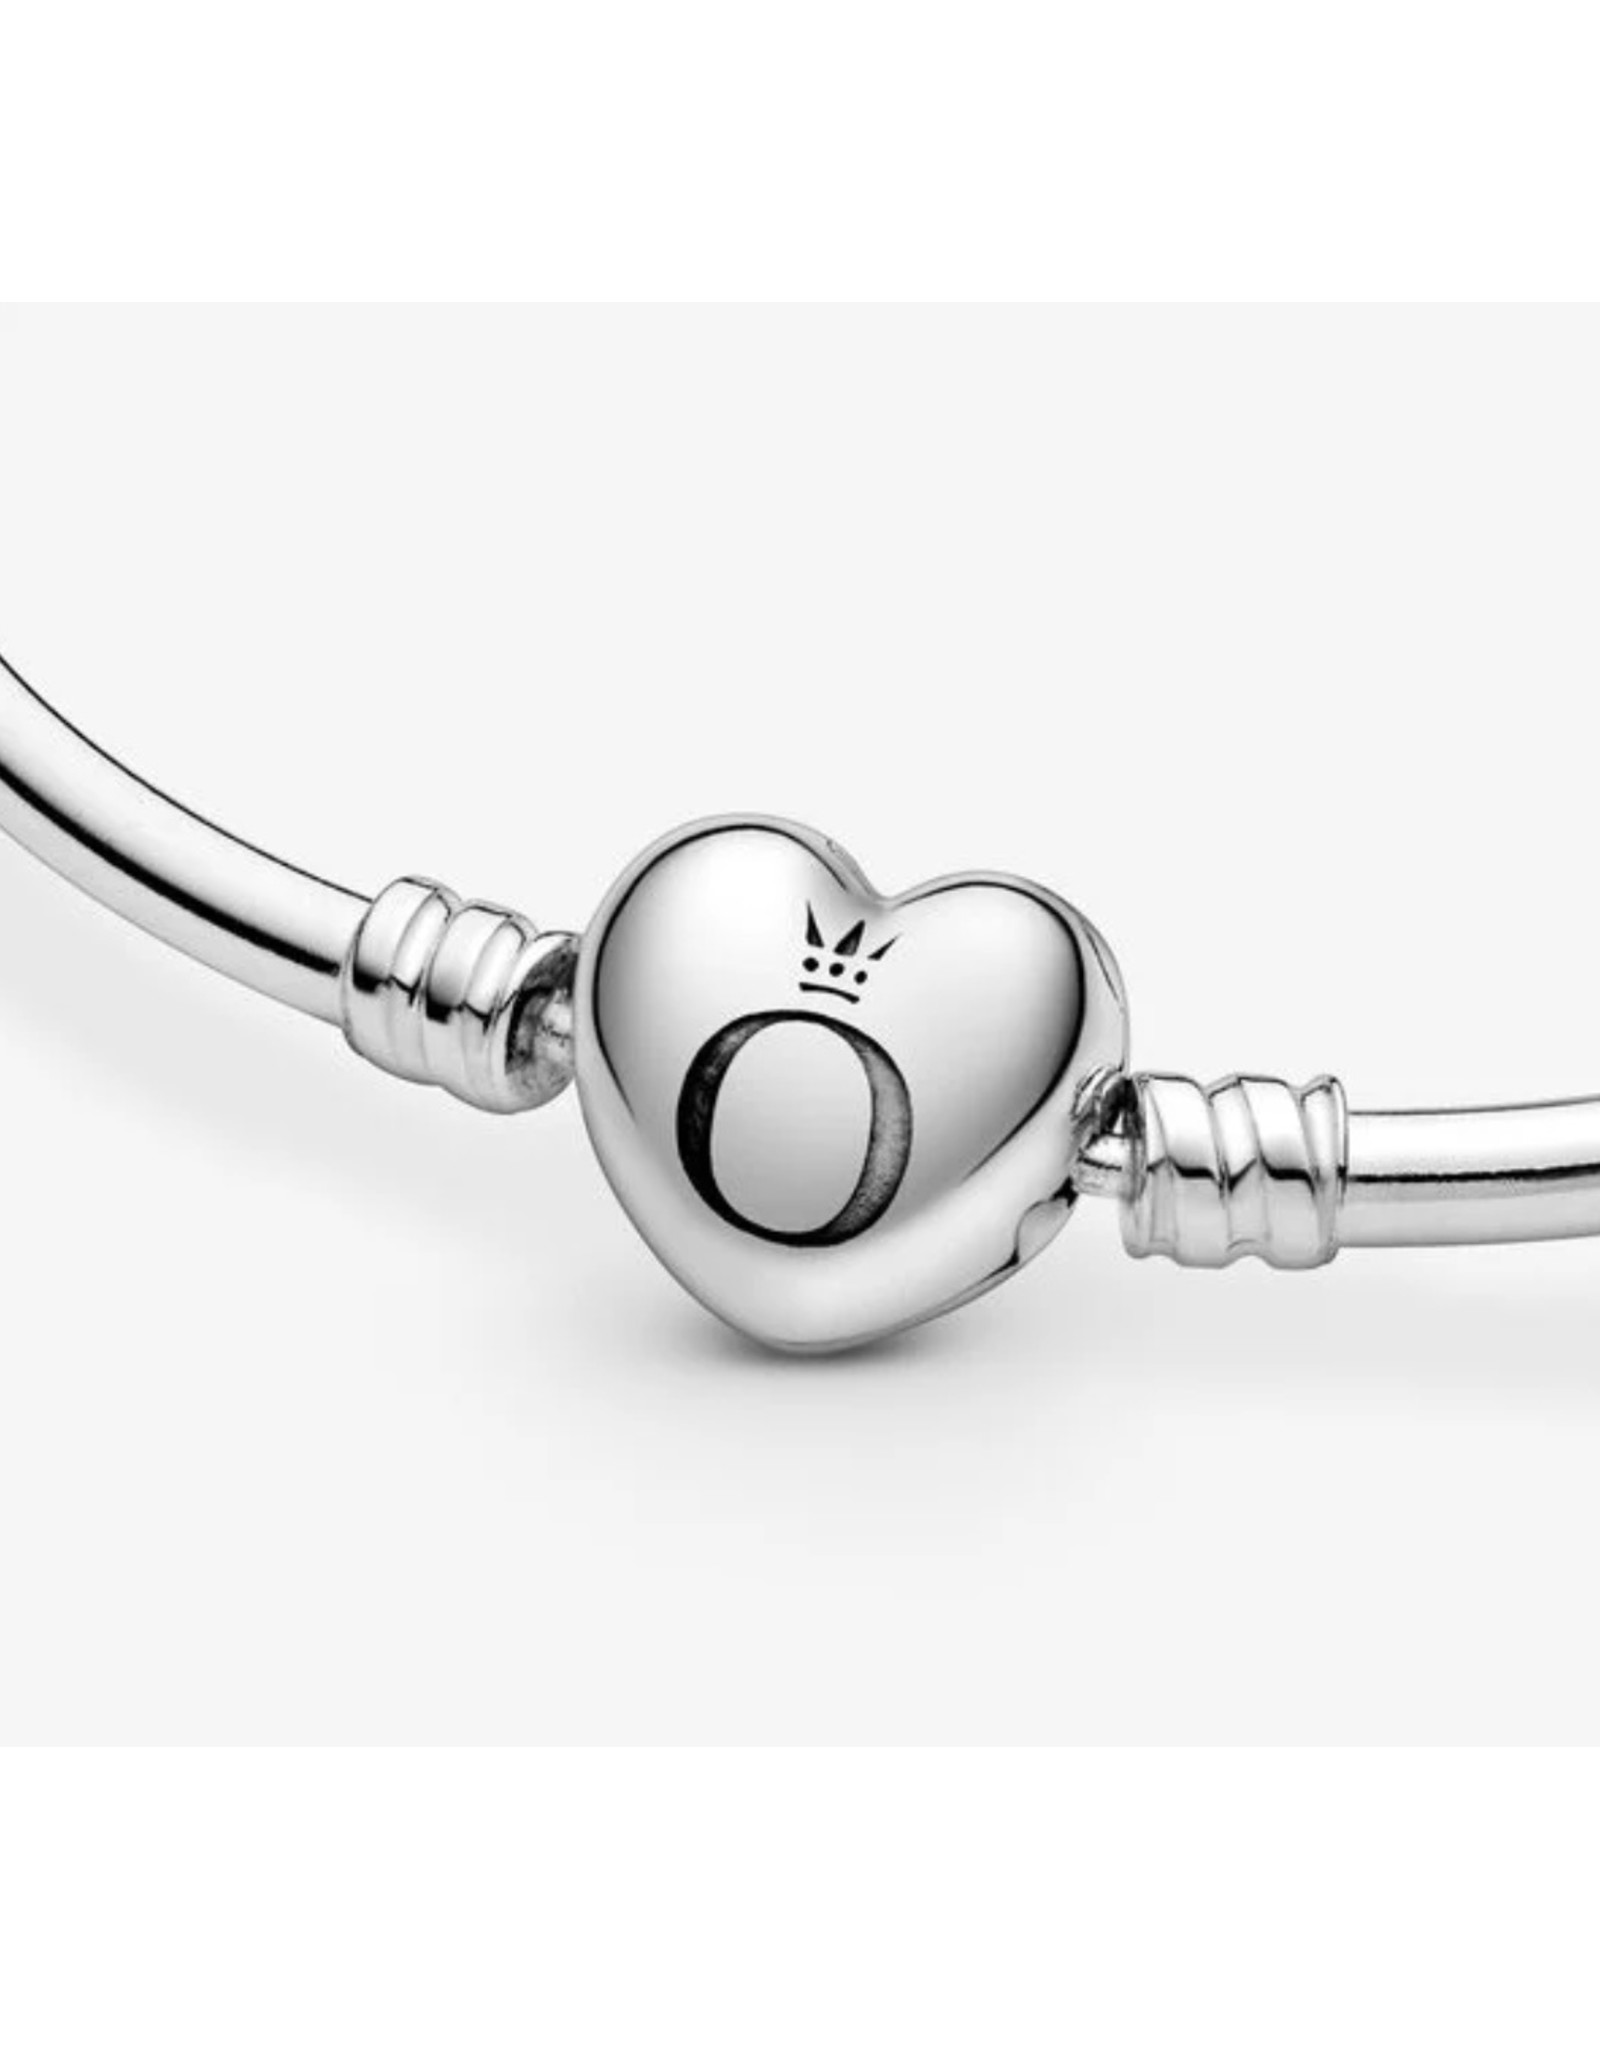 Pandora Pandora Bracelet,596268, Silver Bangle Heart Clasp